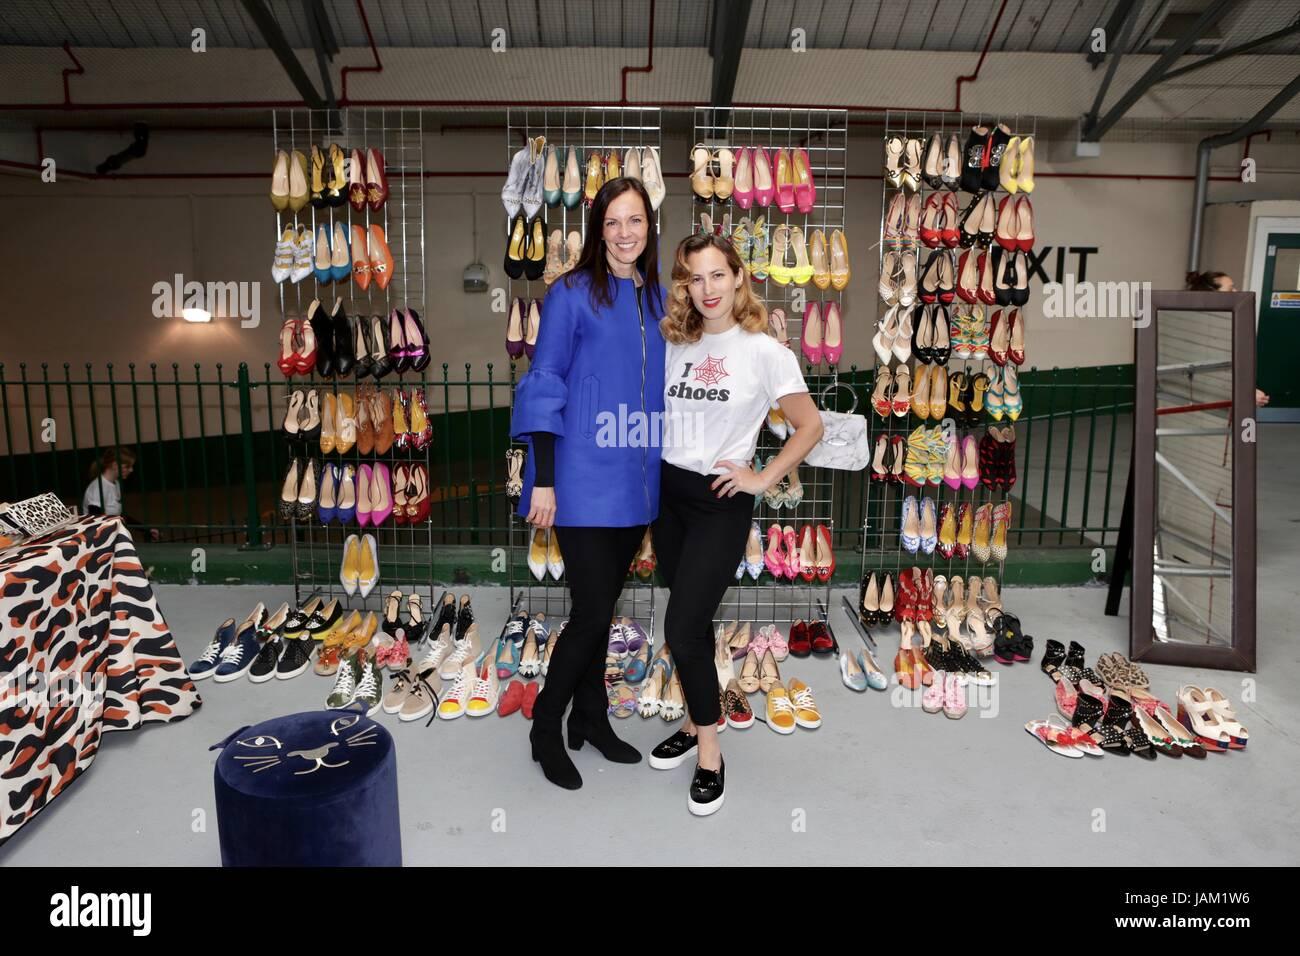 #SheinspiresMe Fashion Car Boot in support of Women for Women International  Featuring: Brita Fernandez Schmidt, - Stock Image